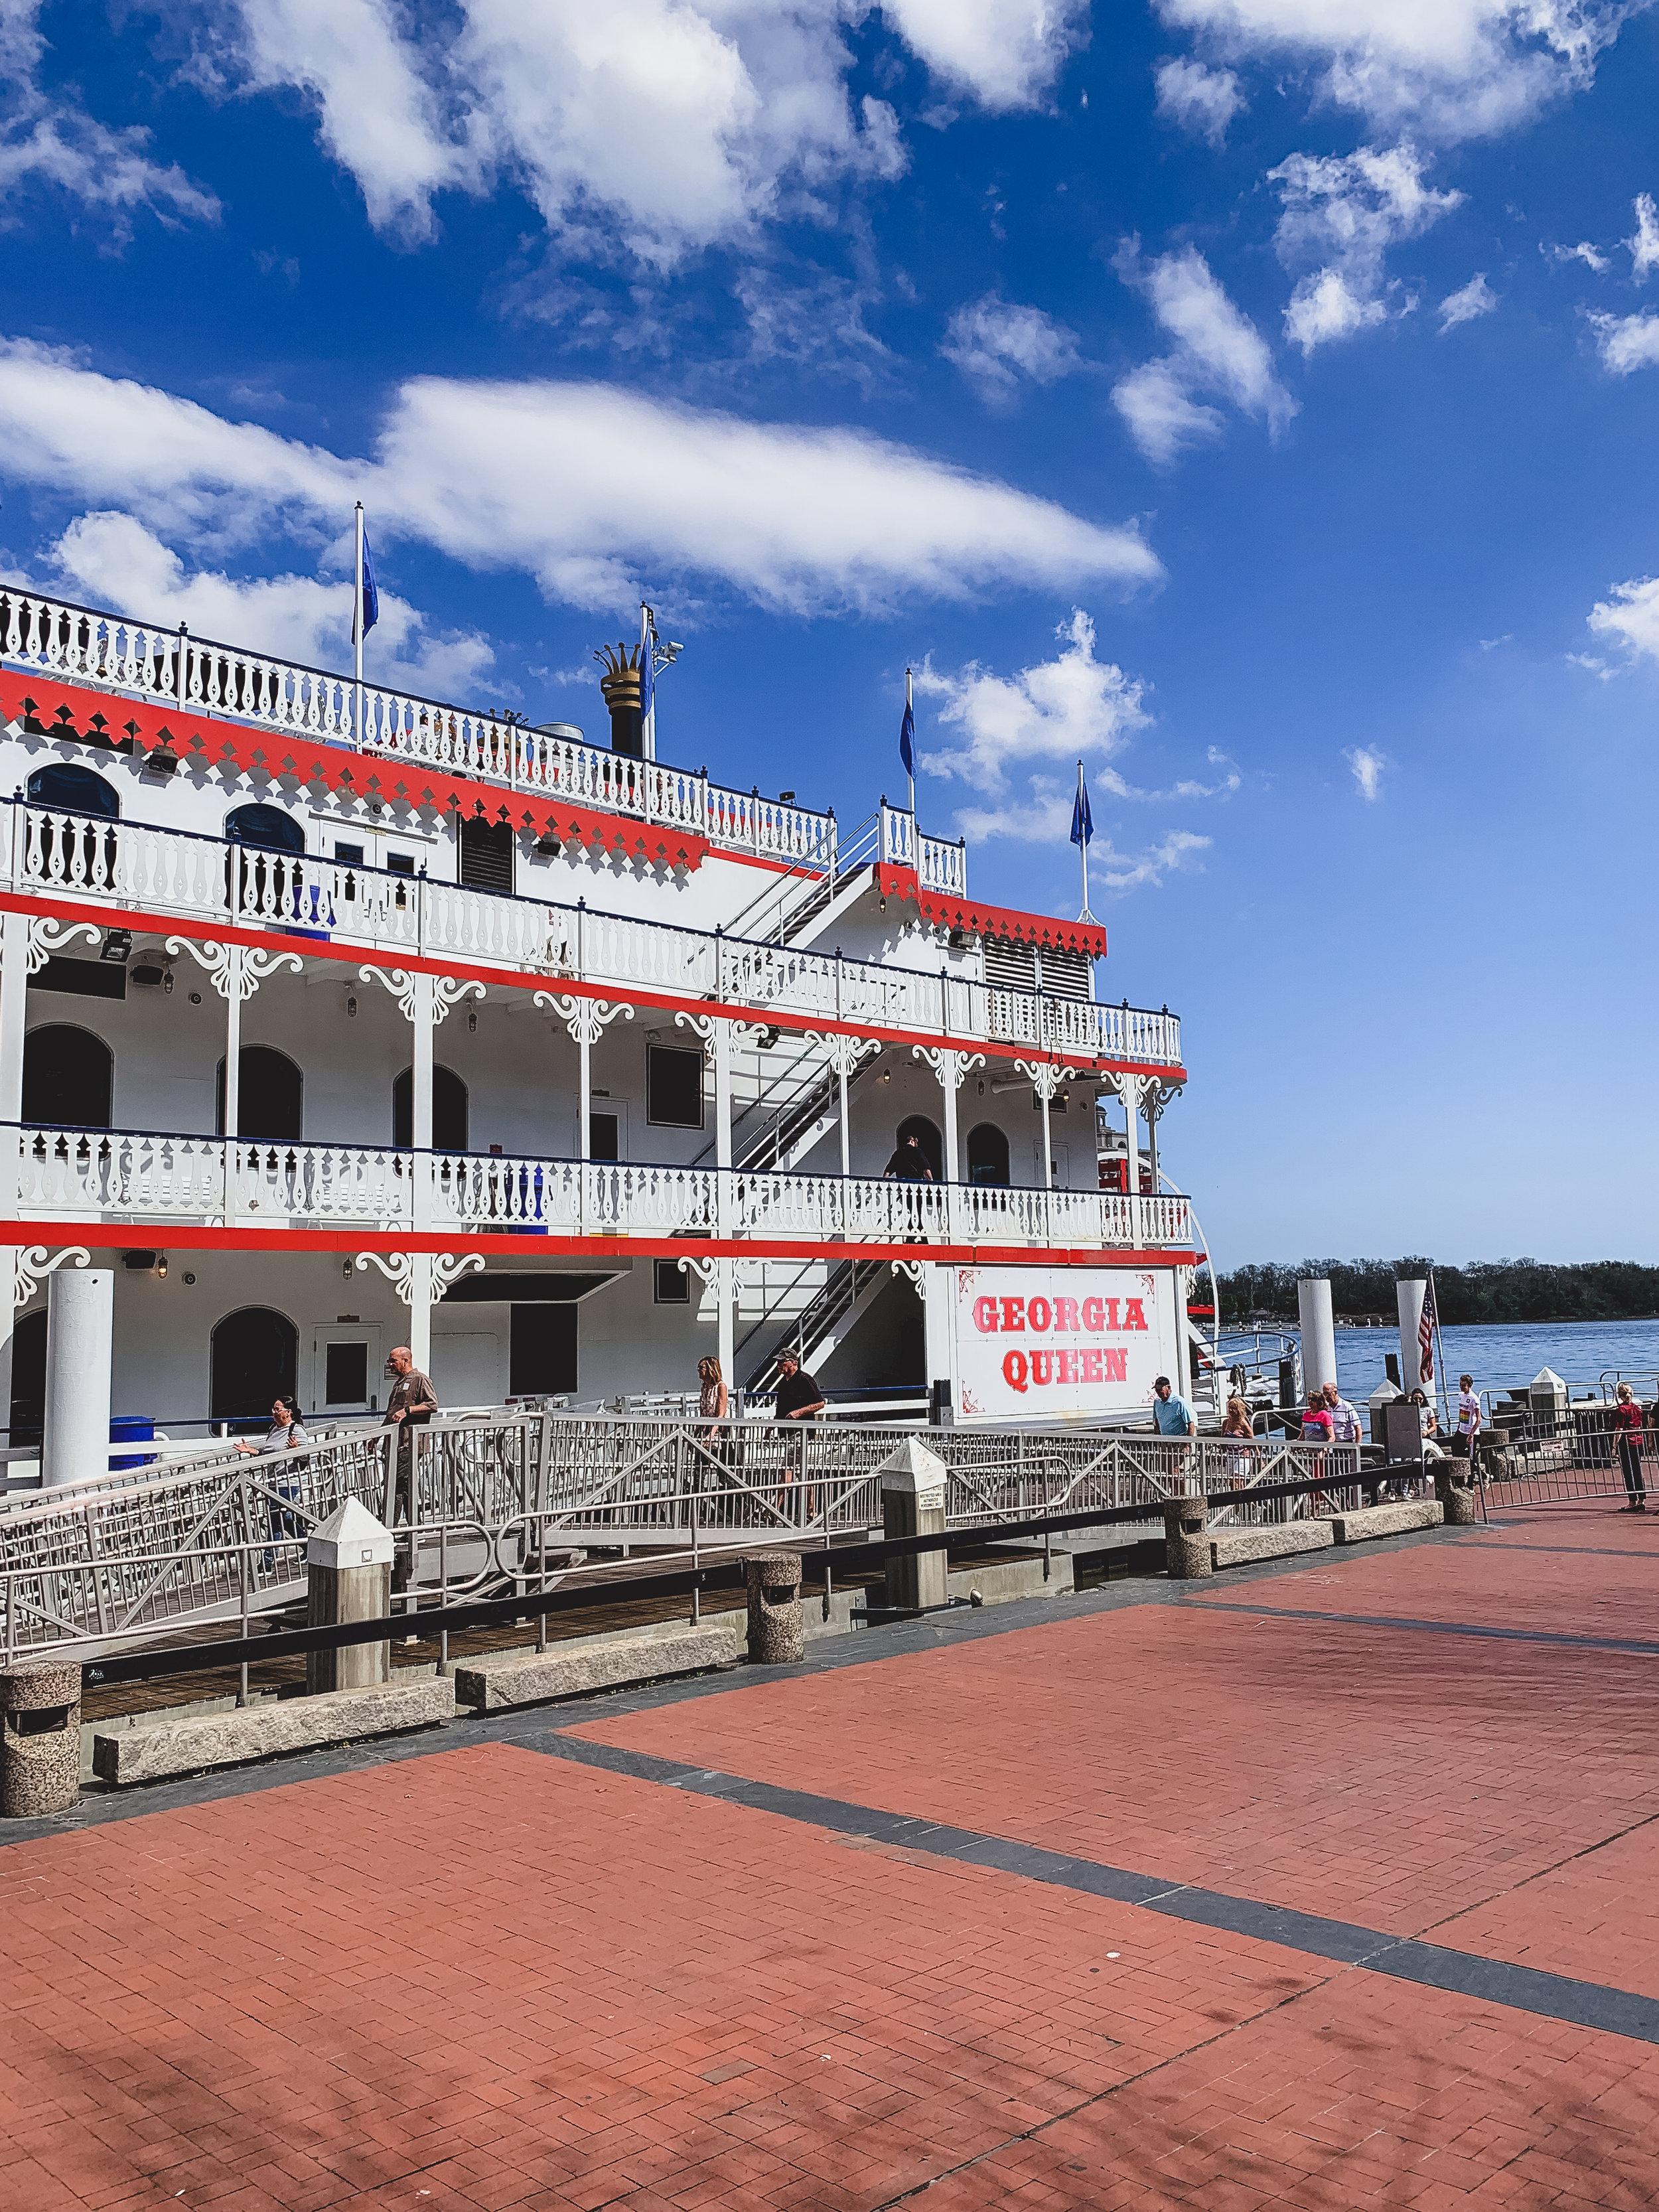 LSS Savannah Riverboat Cruise